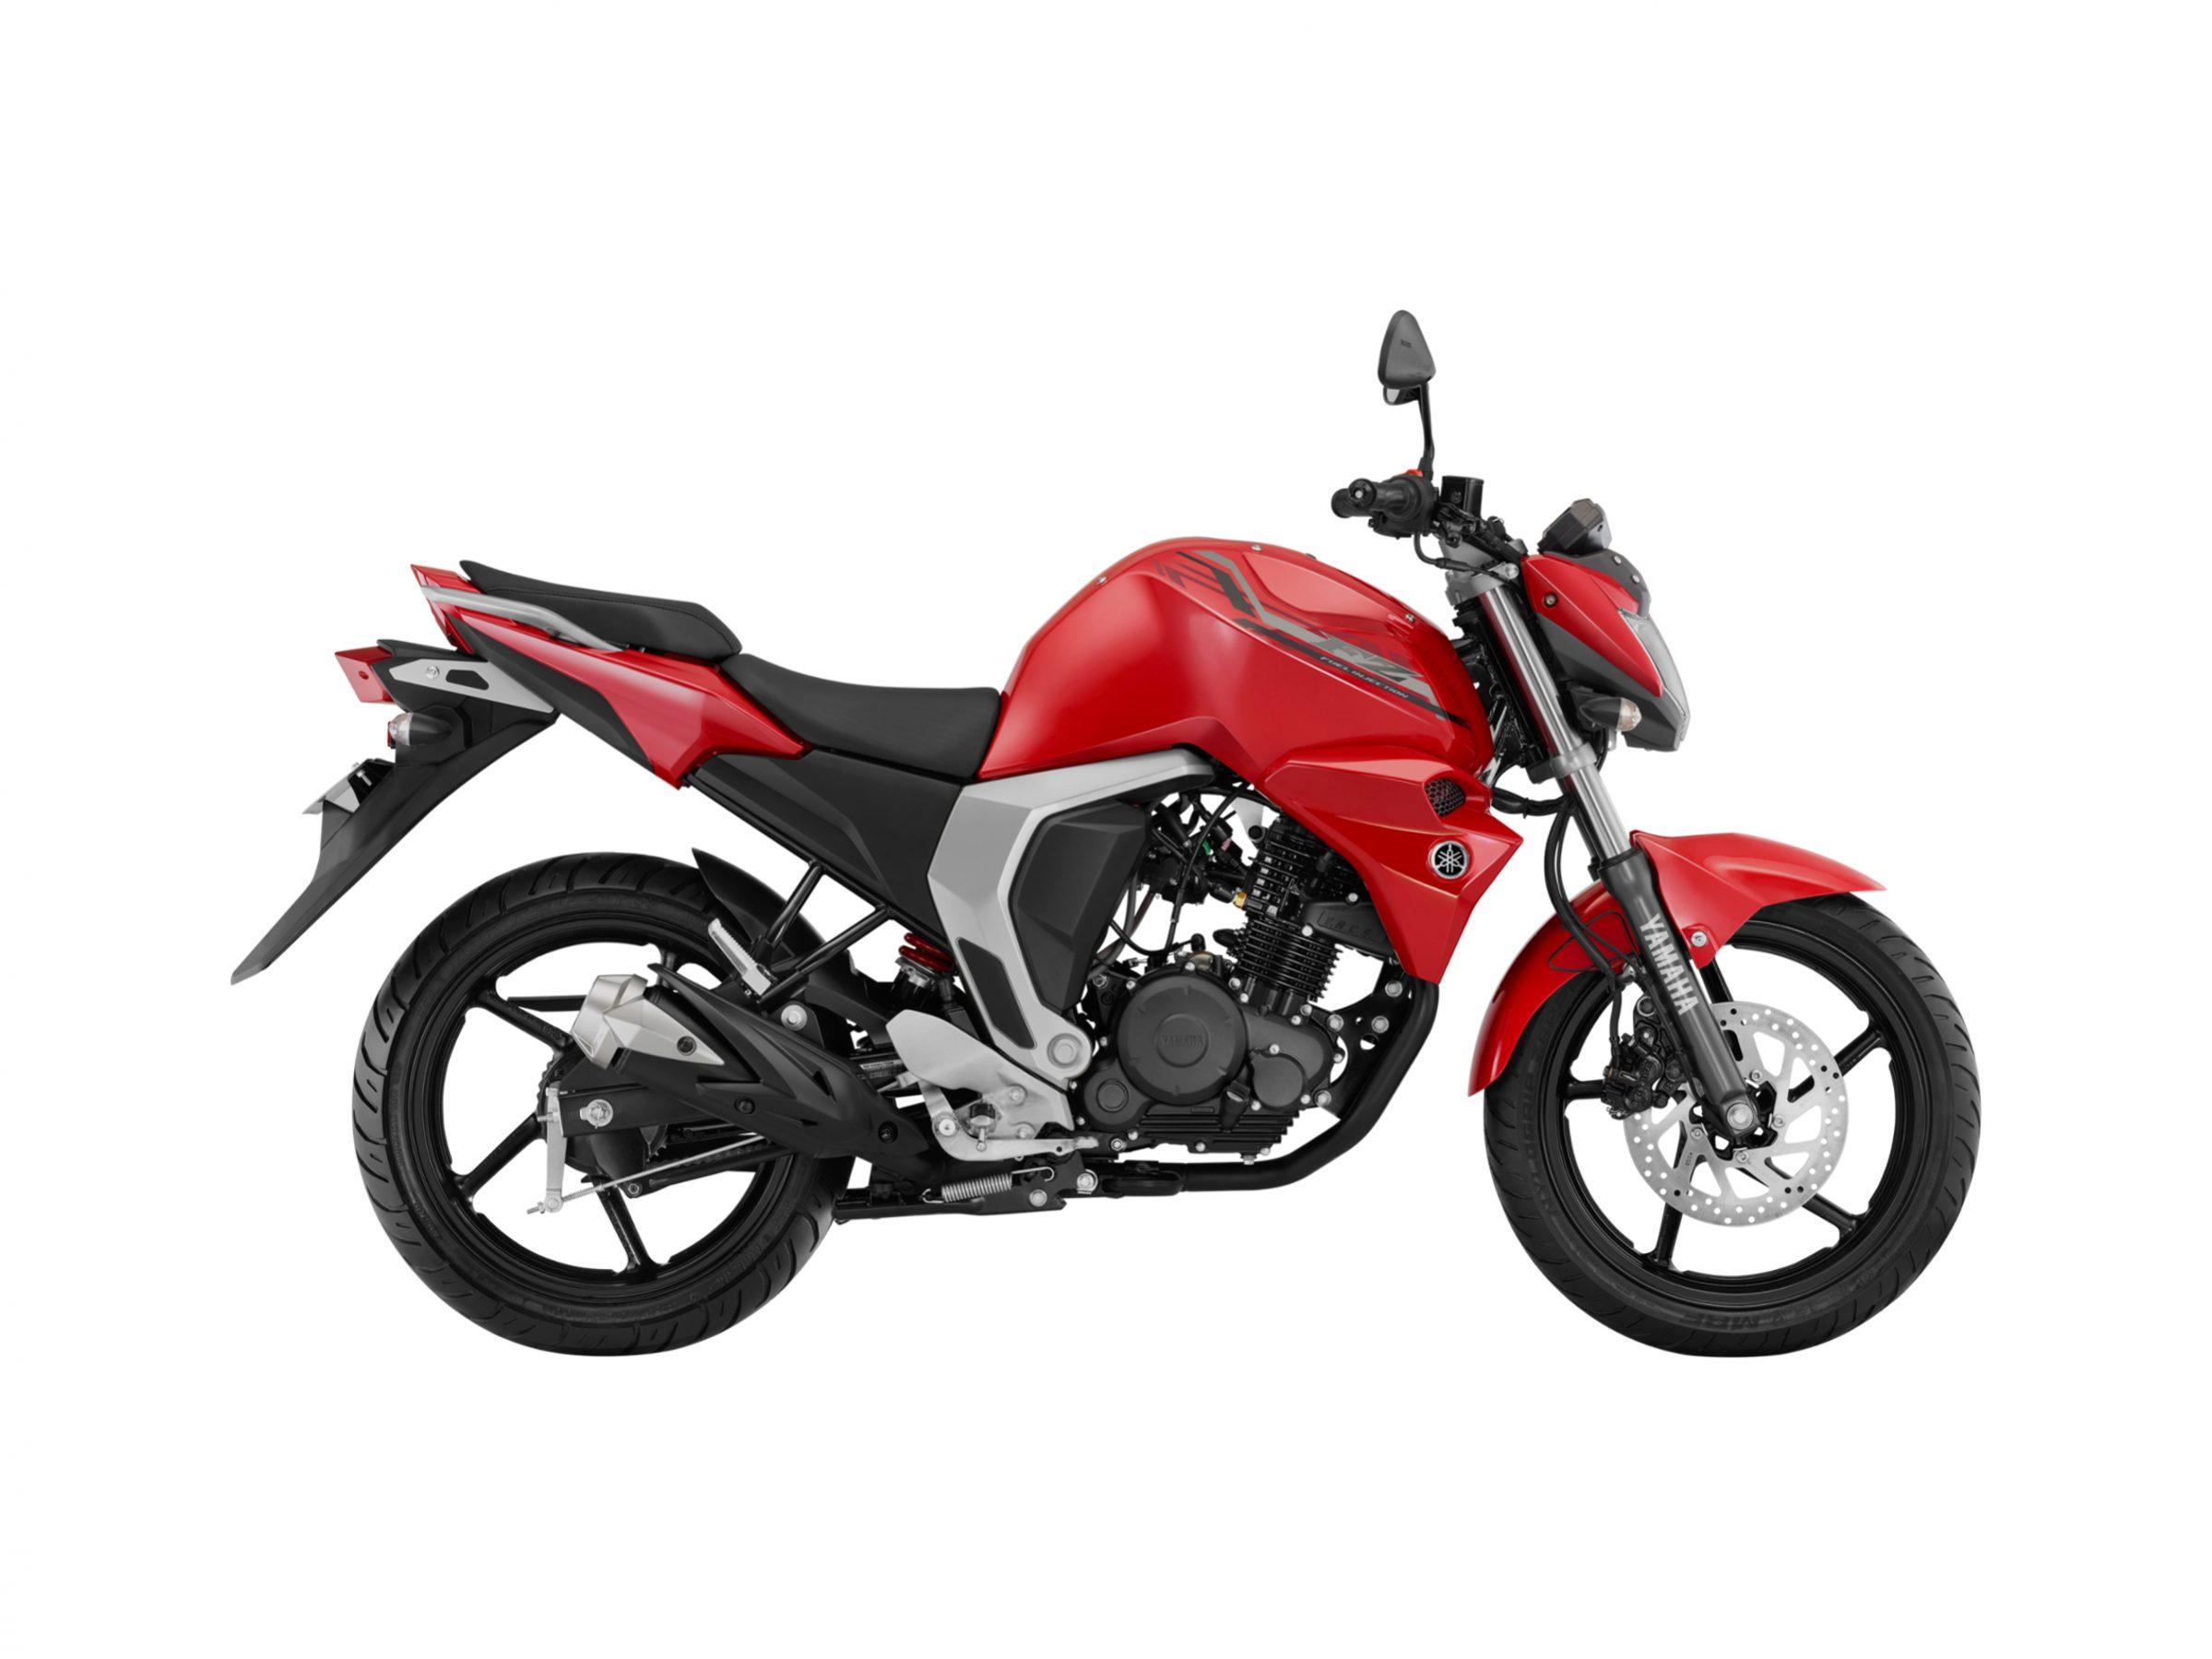 FZ FI - Yamaha Pergamino Motos